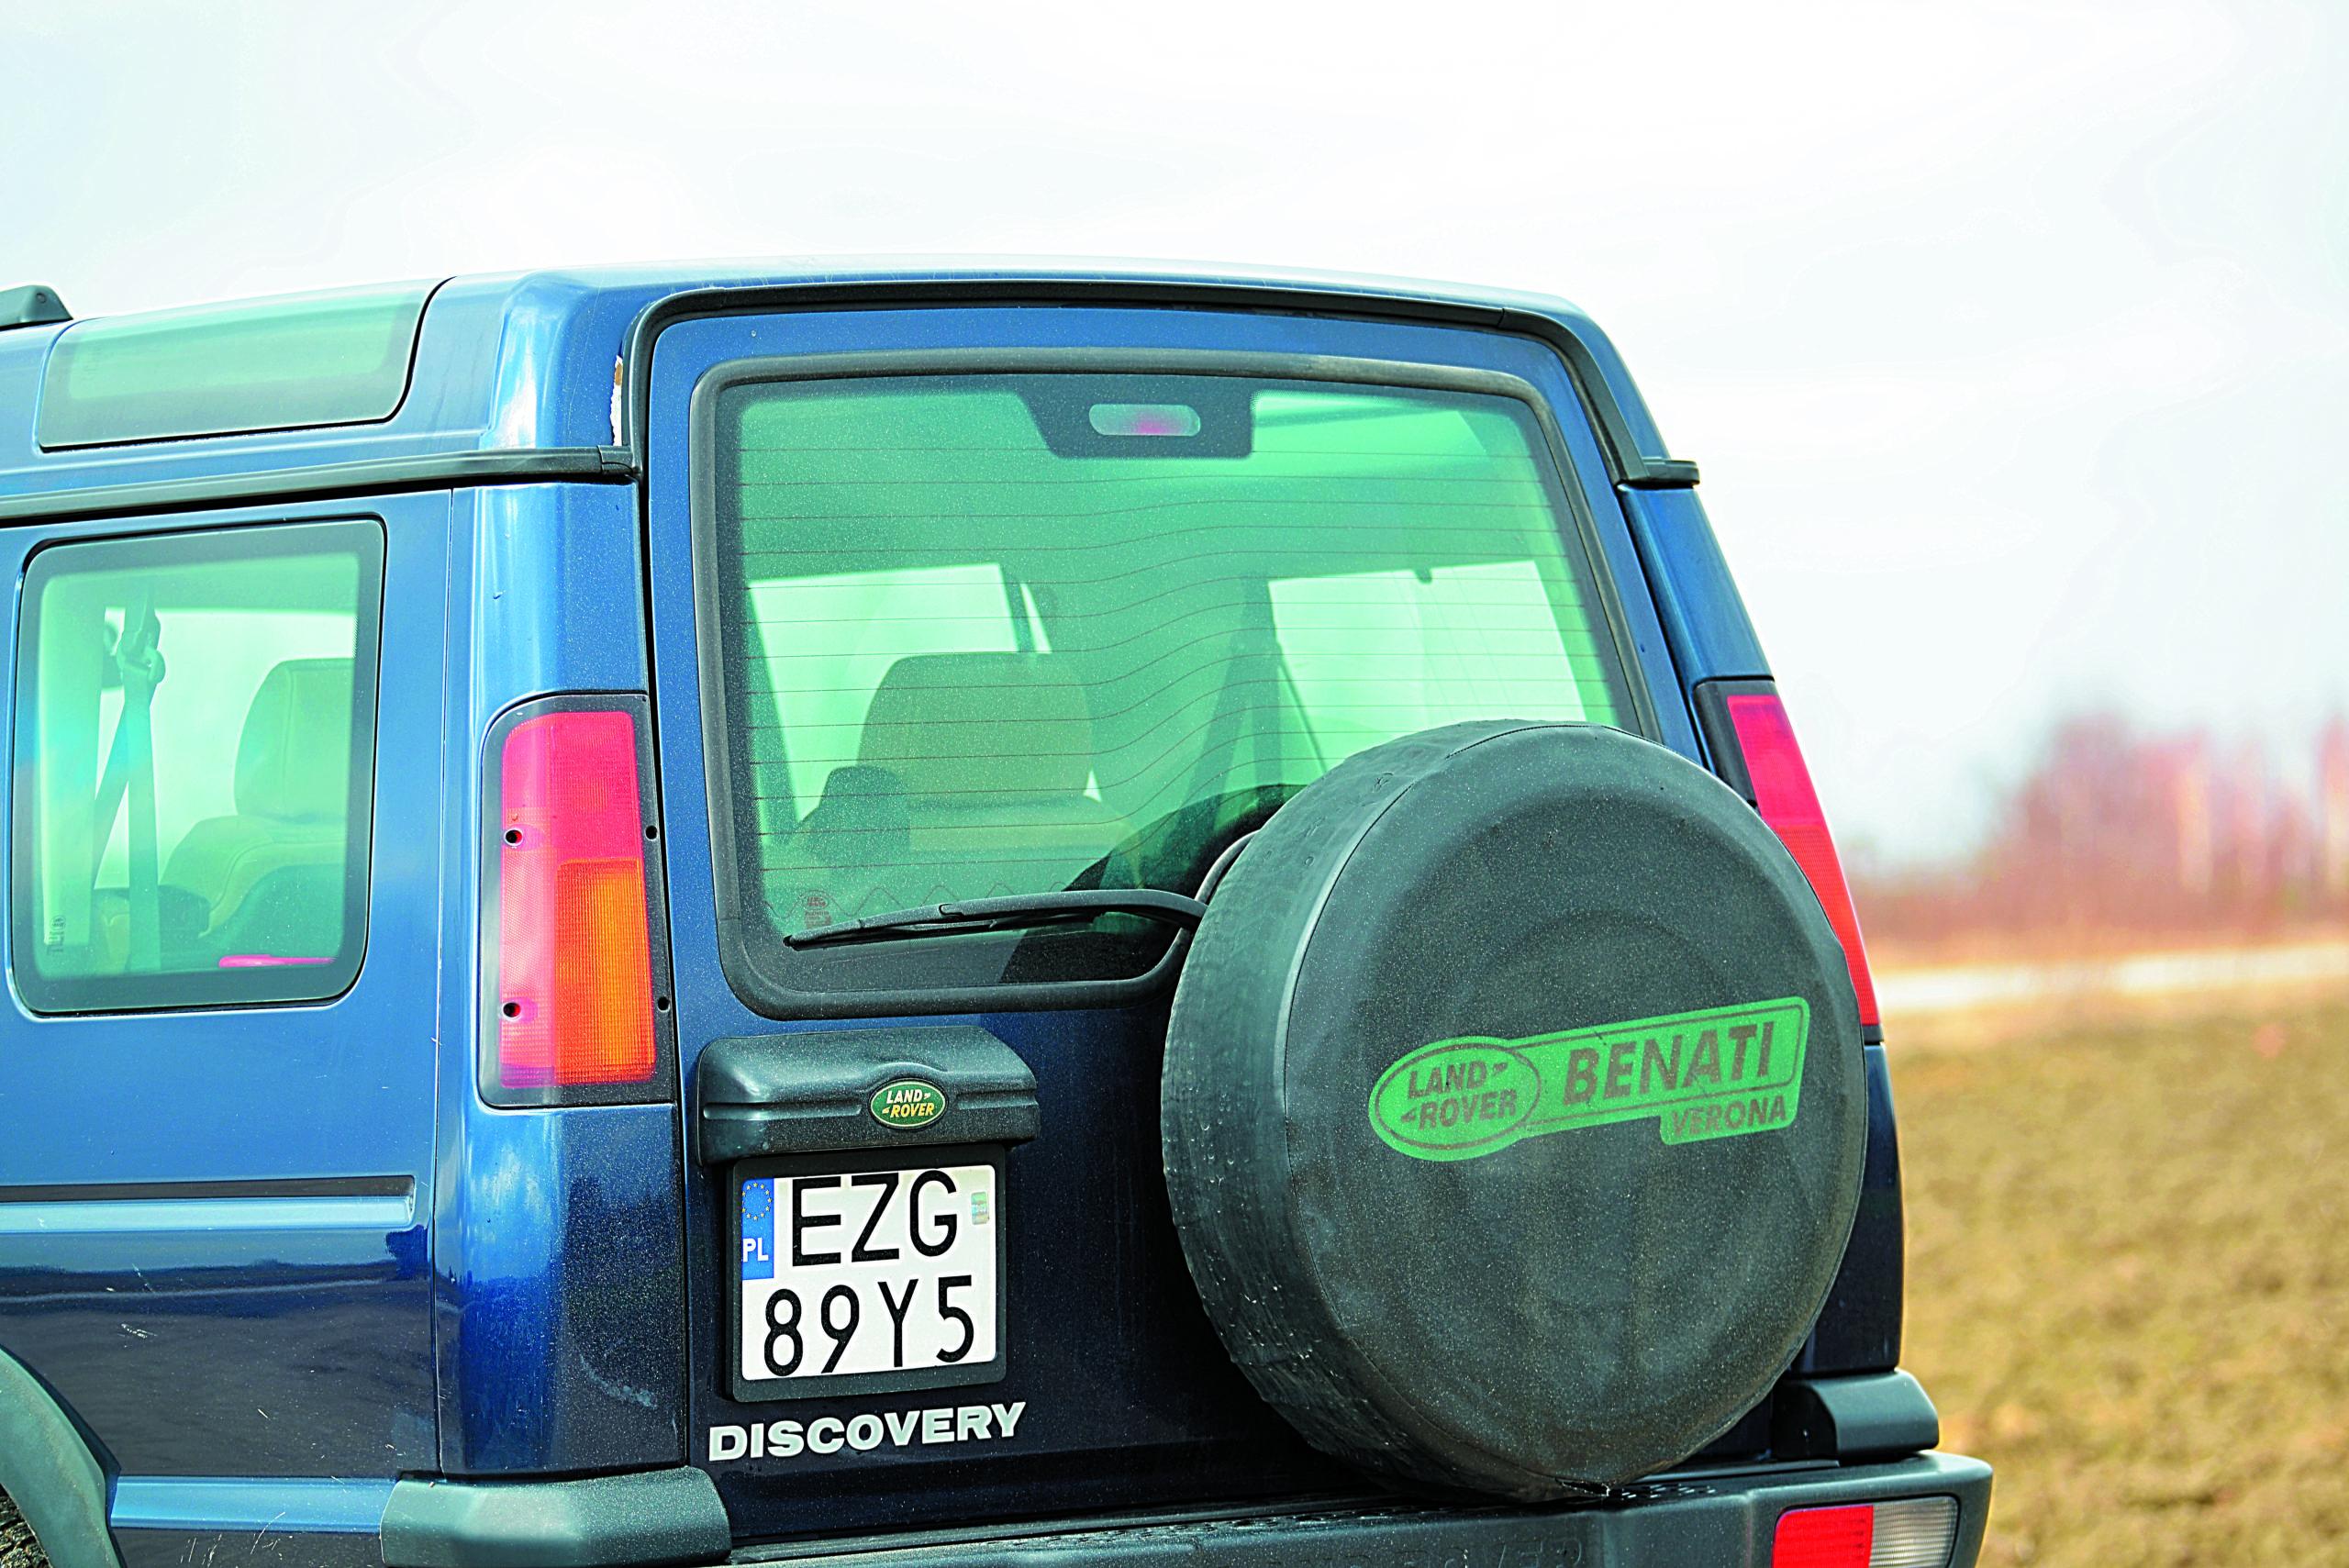 LAnd Rover Discovery 2-tył auta